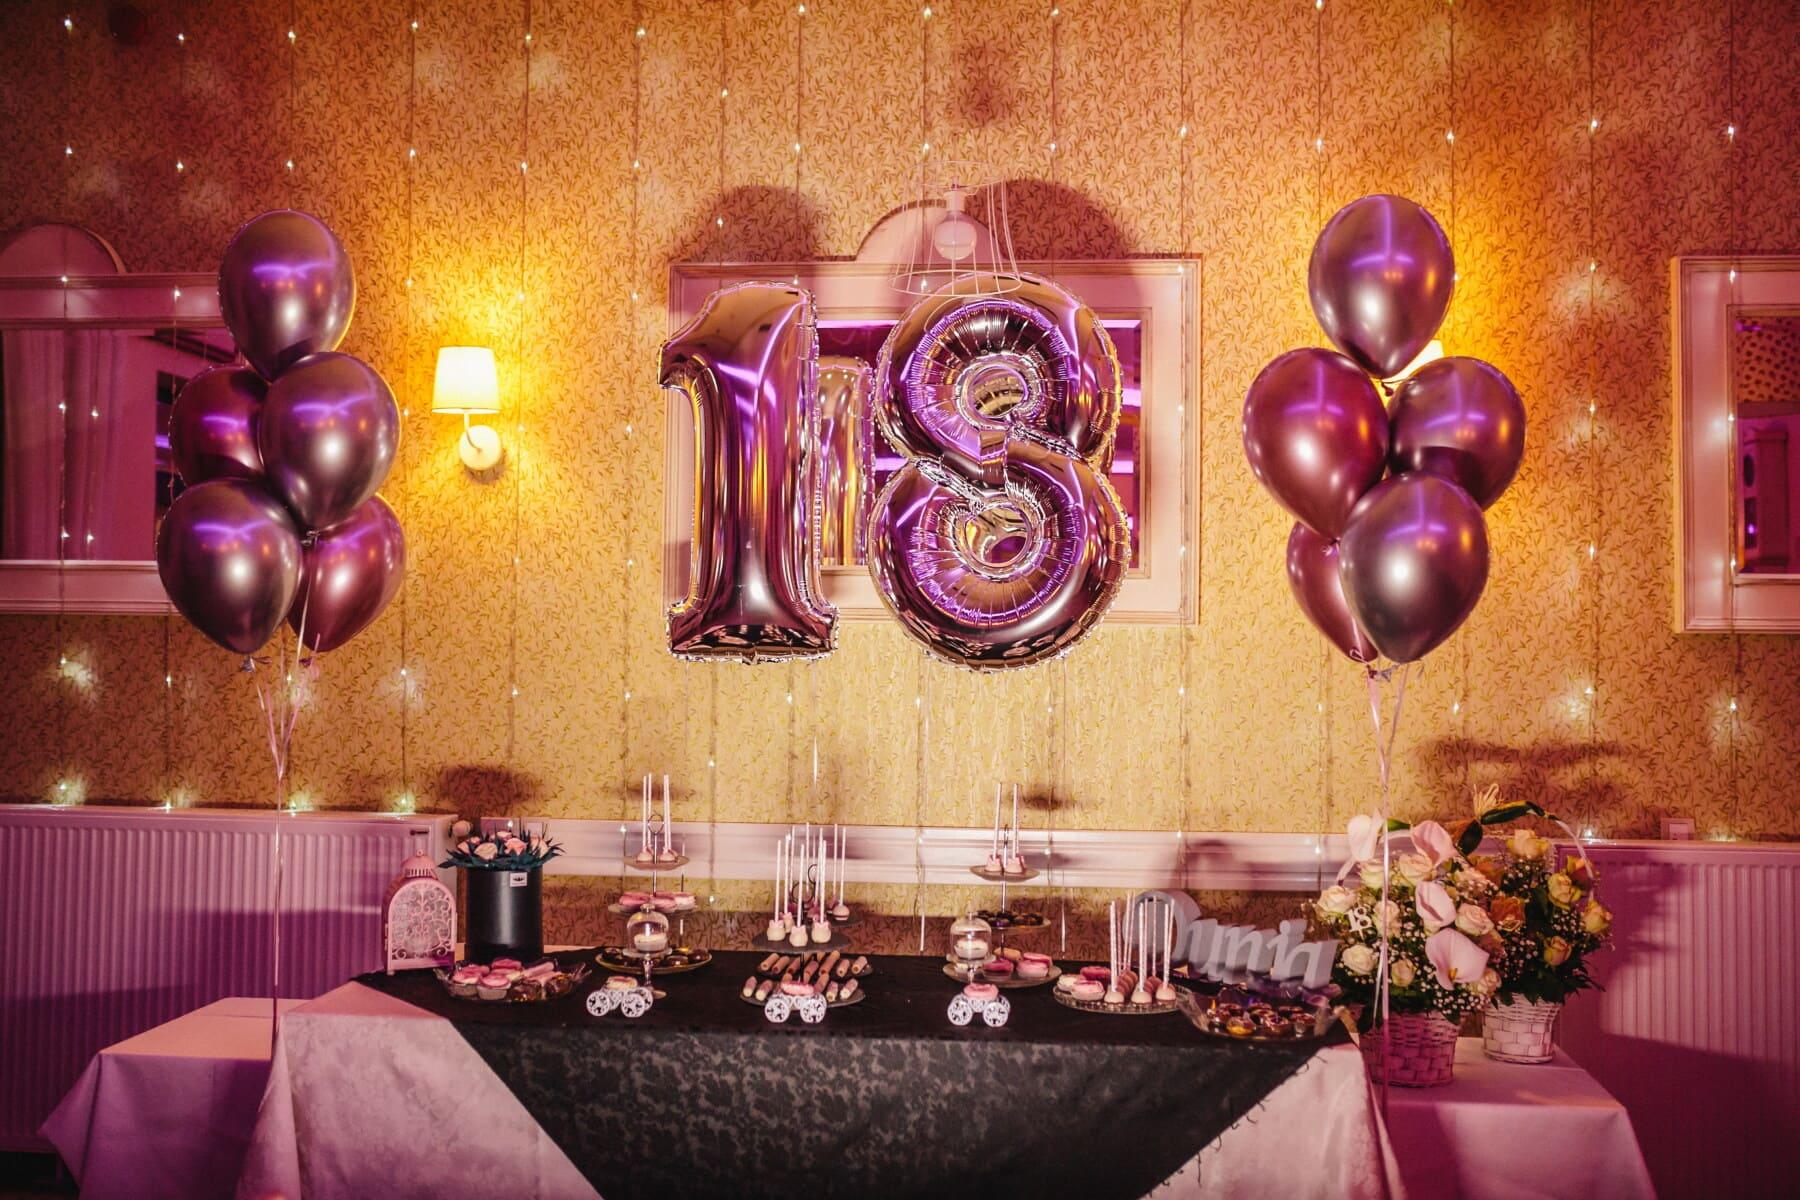 party, 18 birthday, balloon, purple, fancy, interior design, luxury, light, room, inside